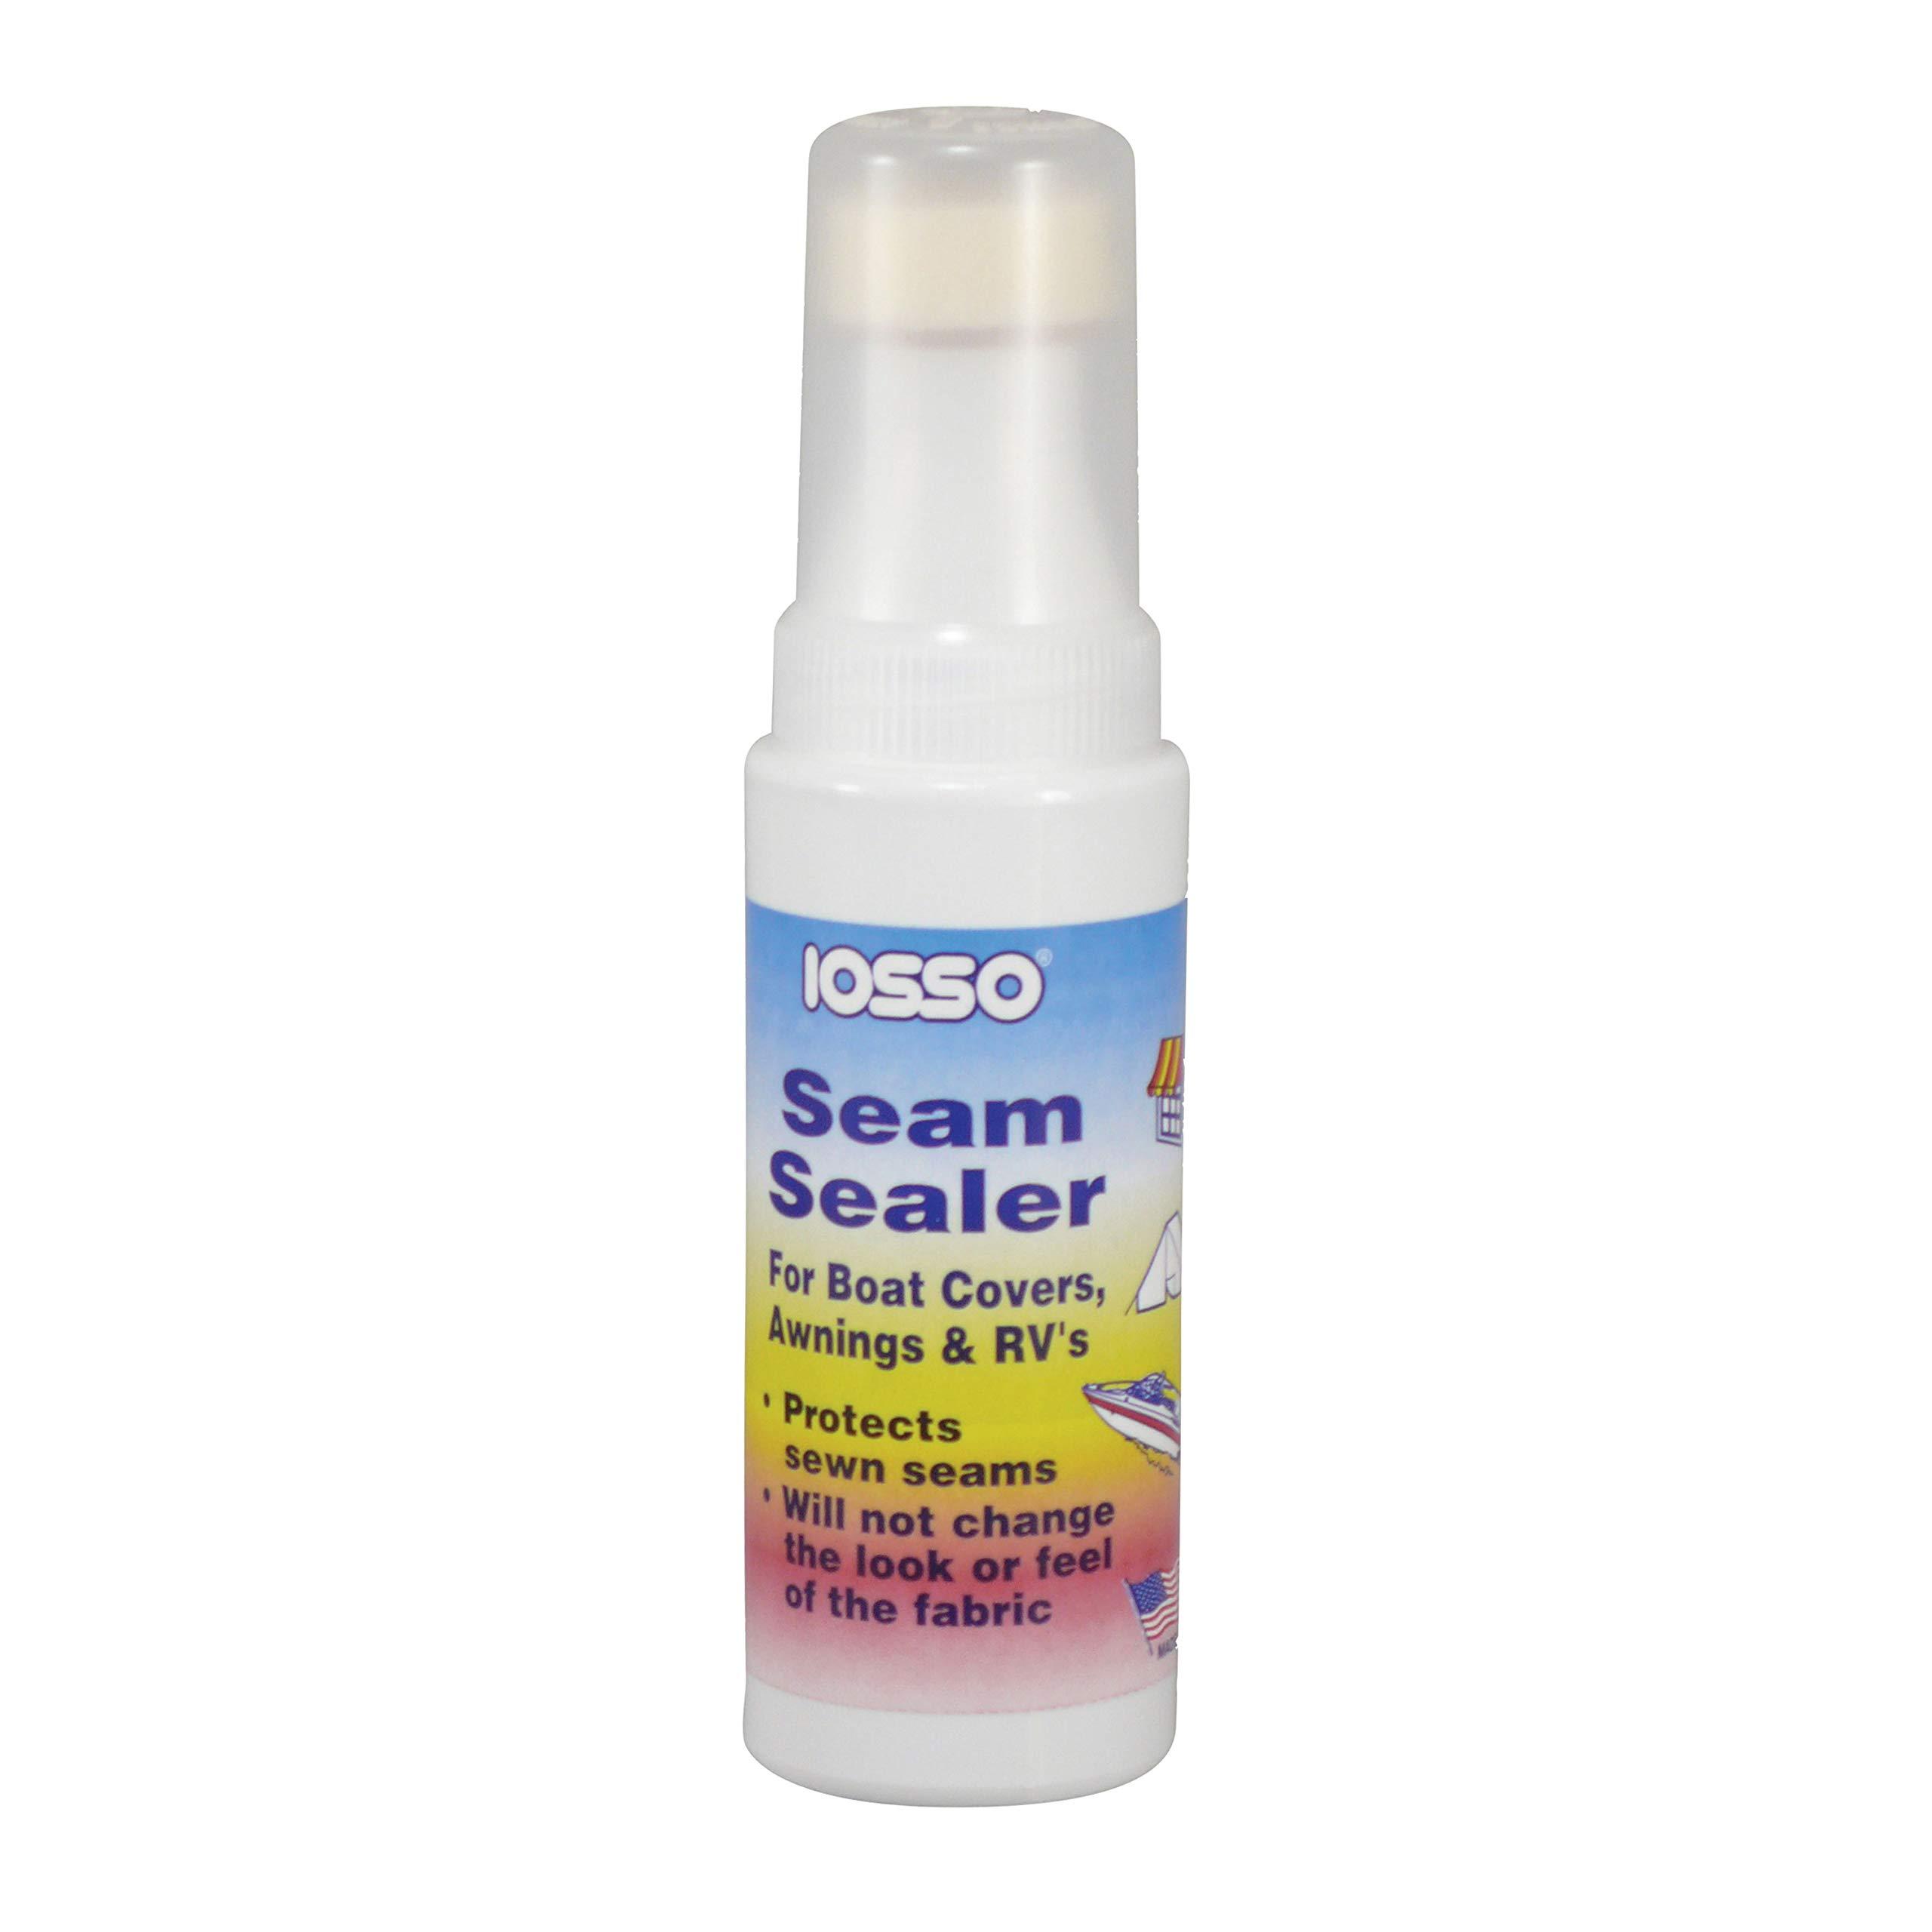 Iosso Products Seam Sealer 4 Oz